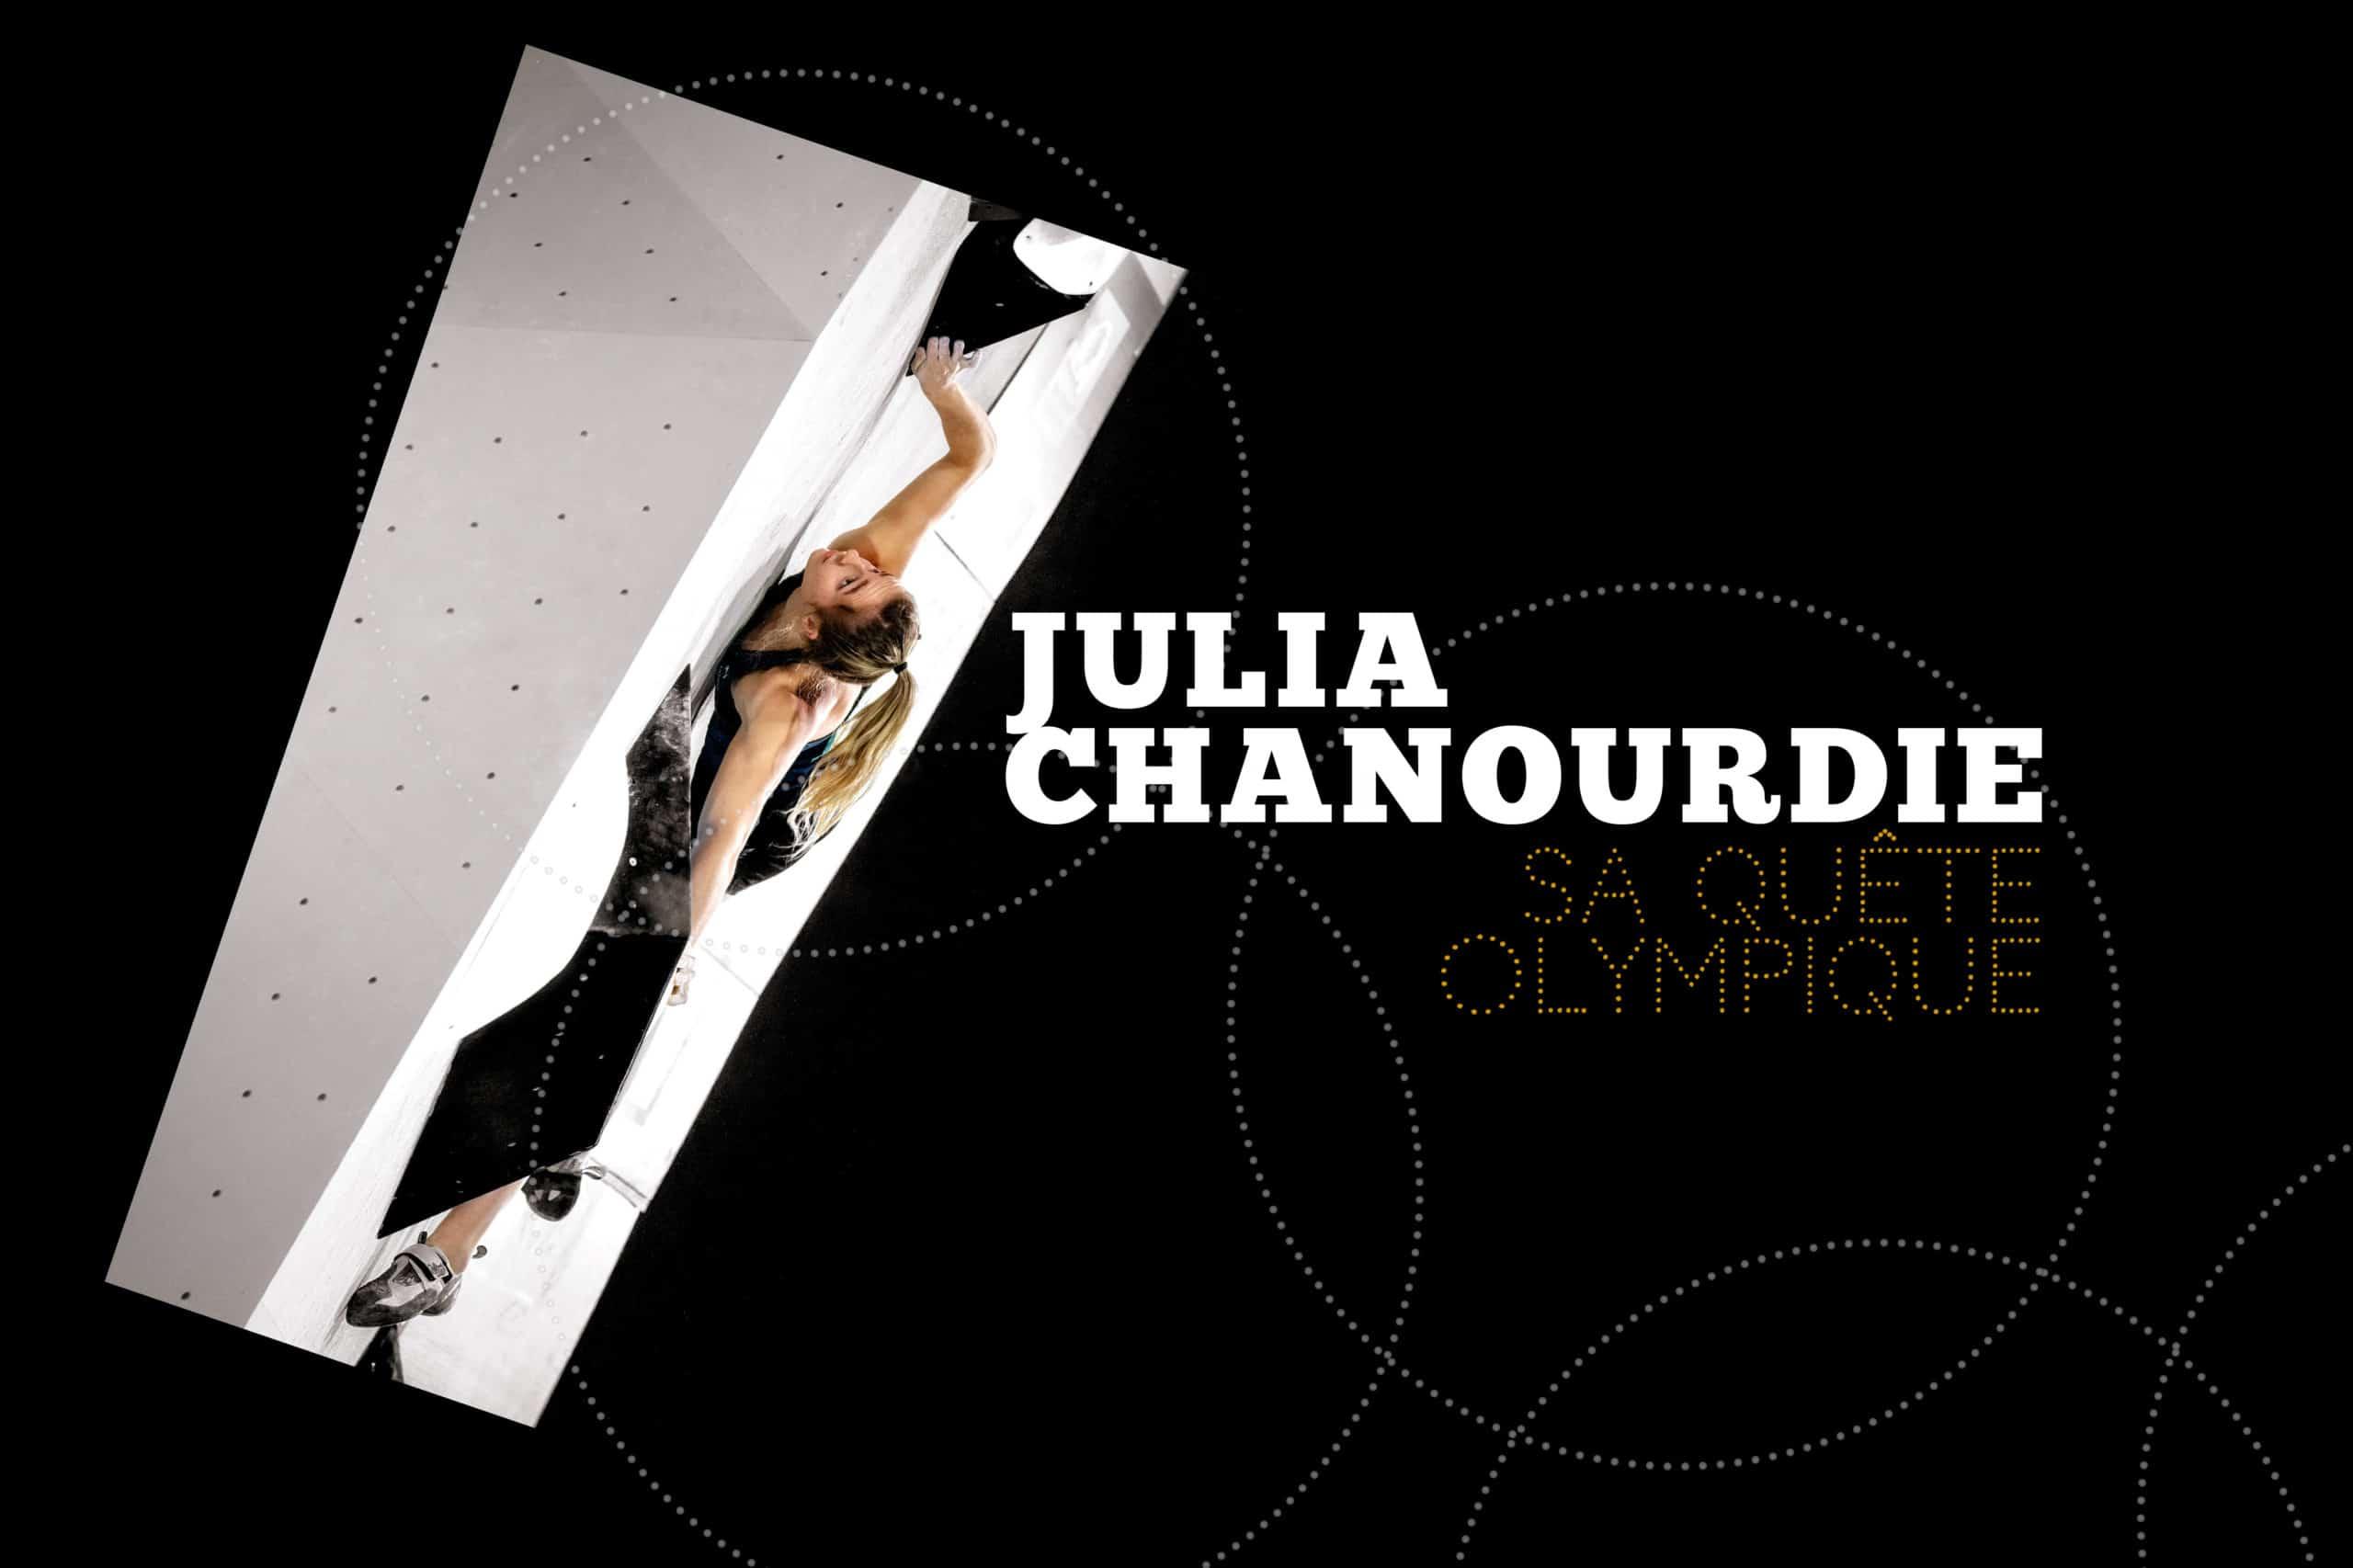 Grande voix #34 – Julia Chanourdie – Sa quête olympique